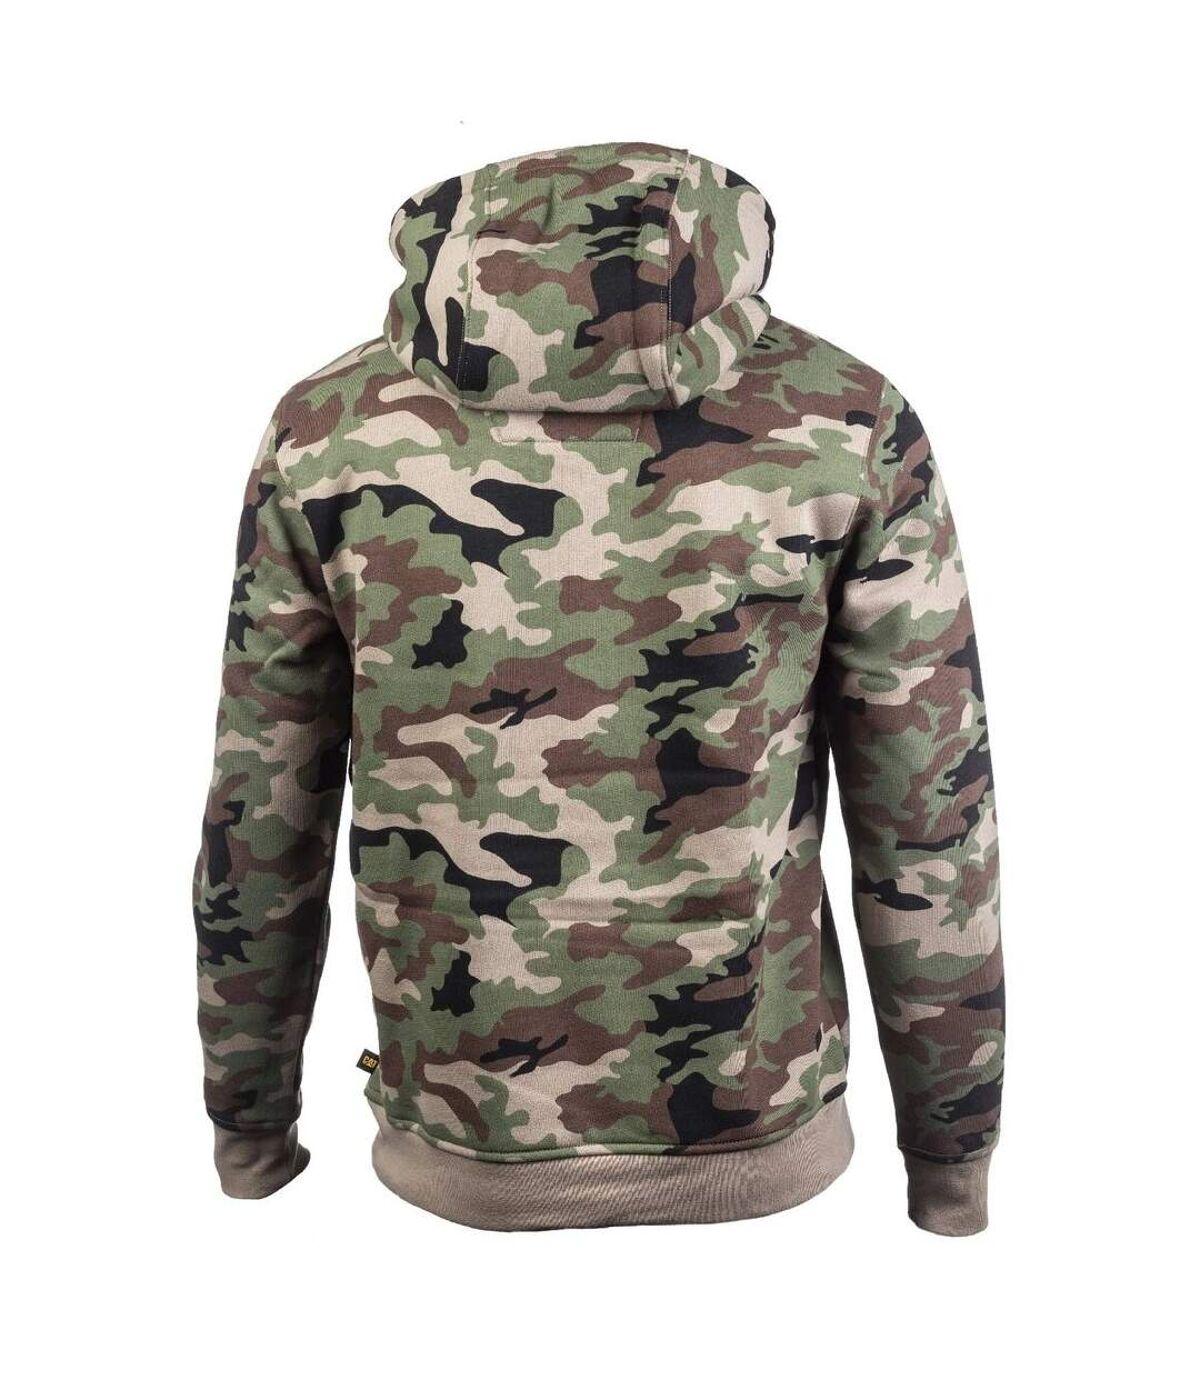 Caterpillar Mens Trademark Hooded Sweatshirt (Woodland Camo) - UTFS4646